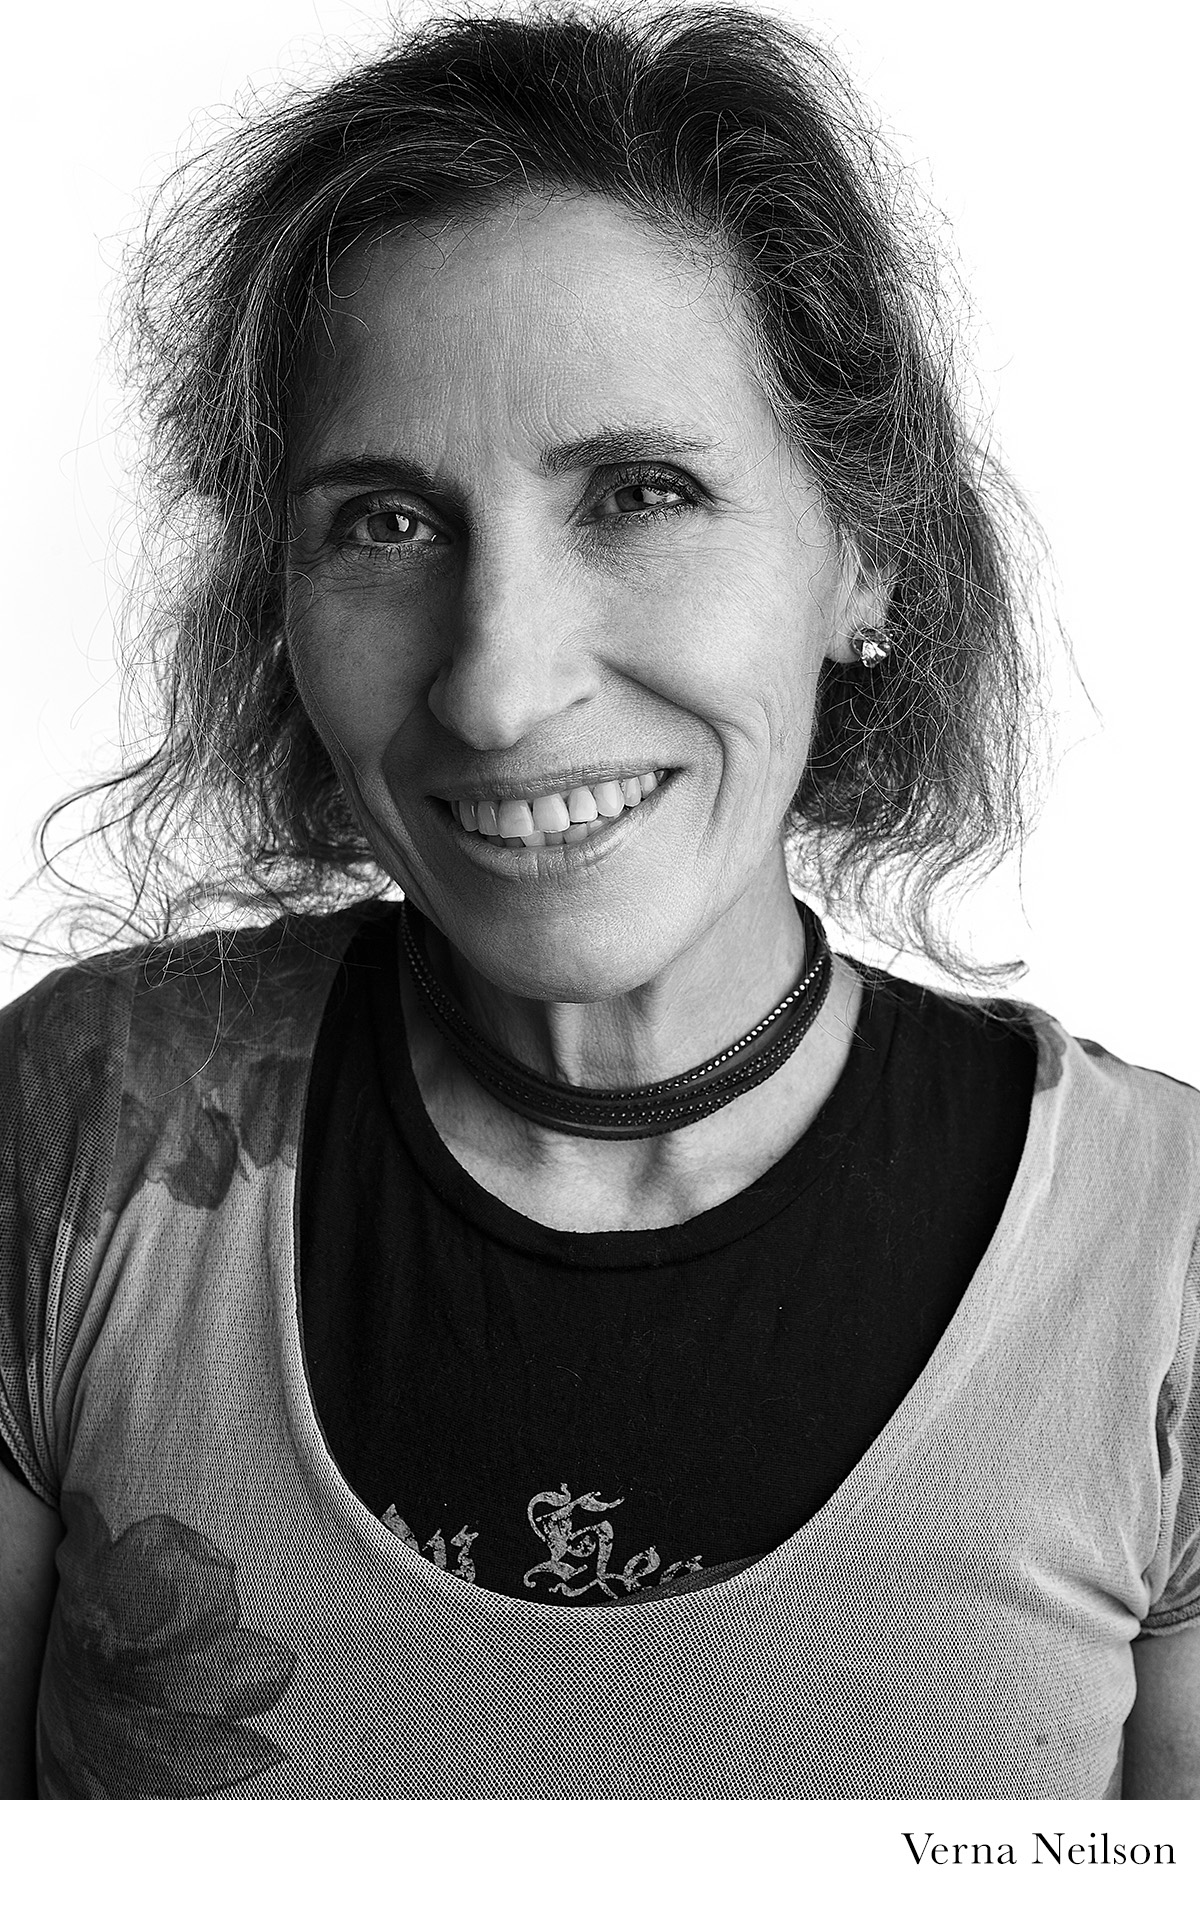 Verna Neilson